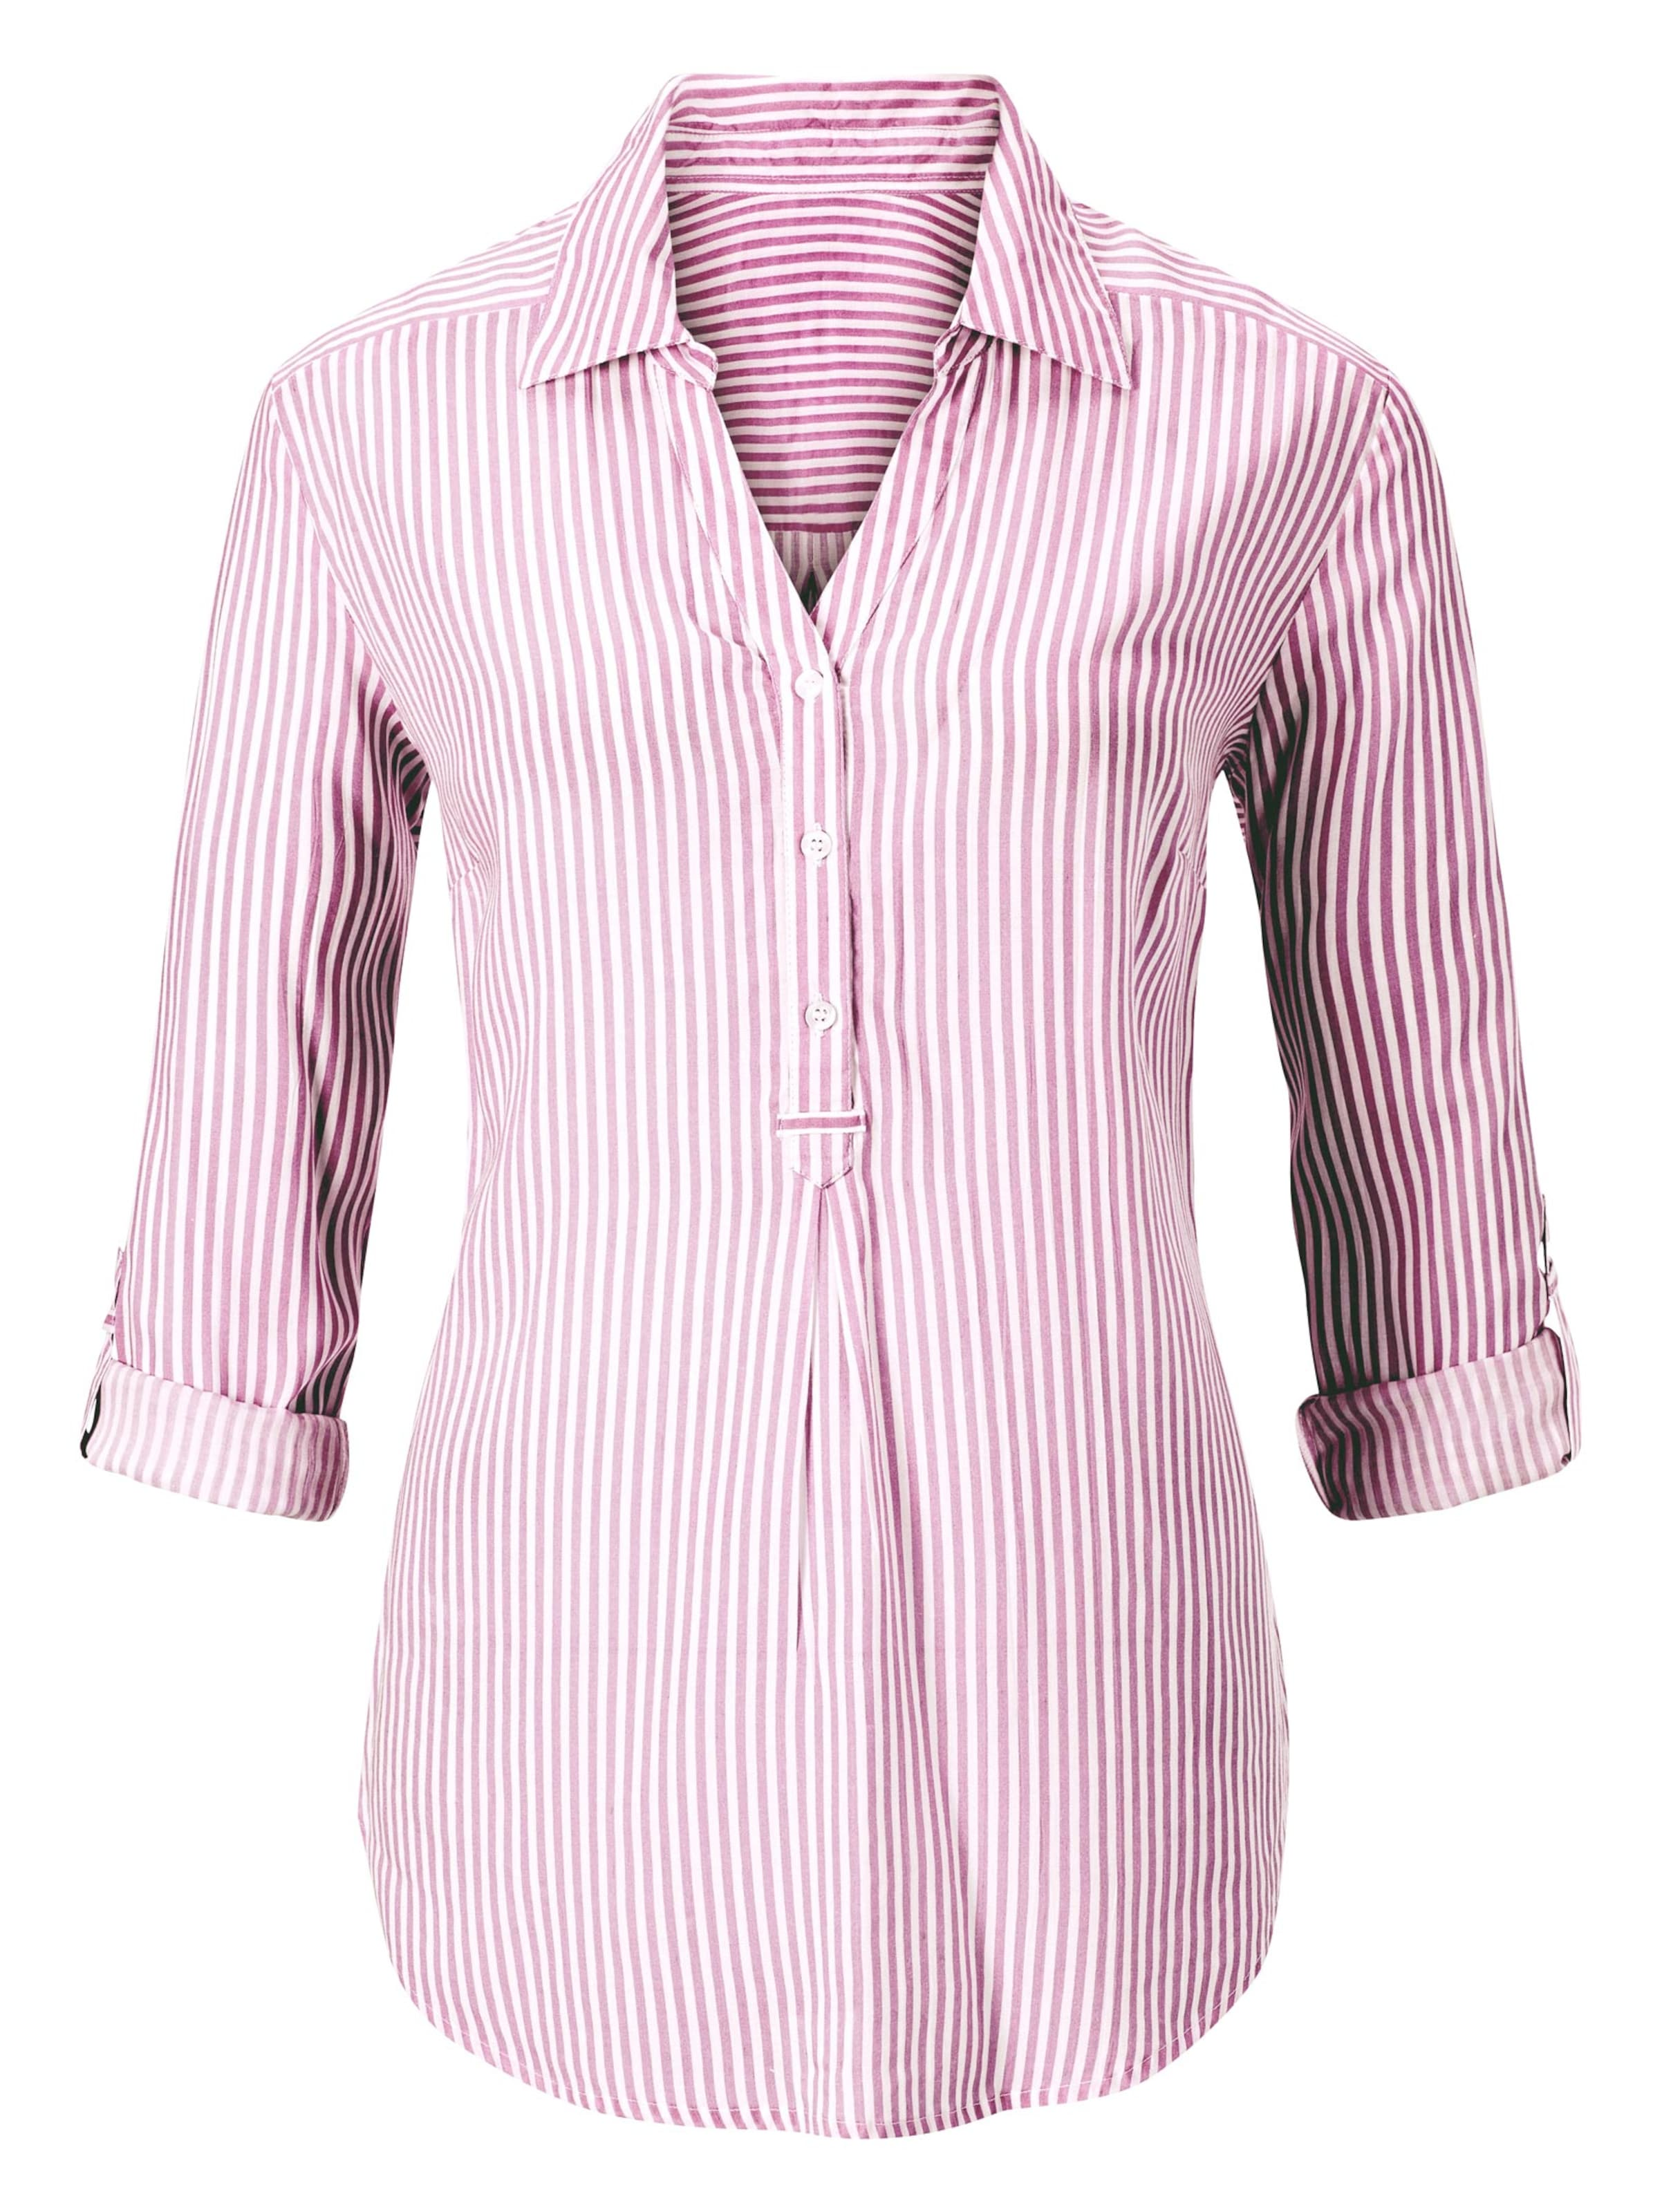 Your Look... for less! Dames Gestreepte blouse bessenrood gestreept Größe